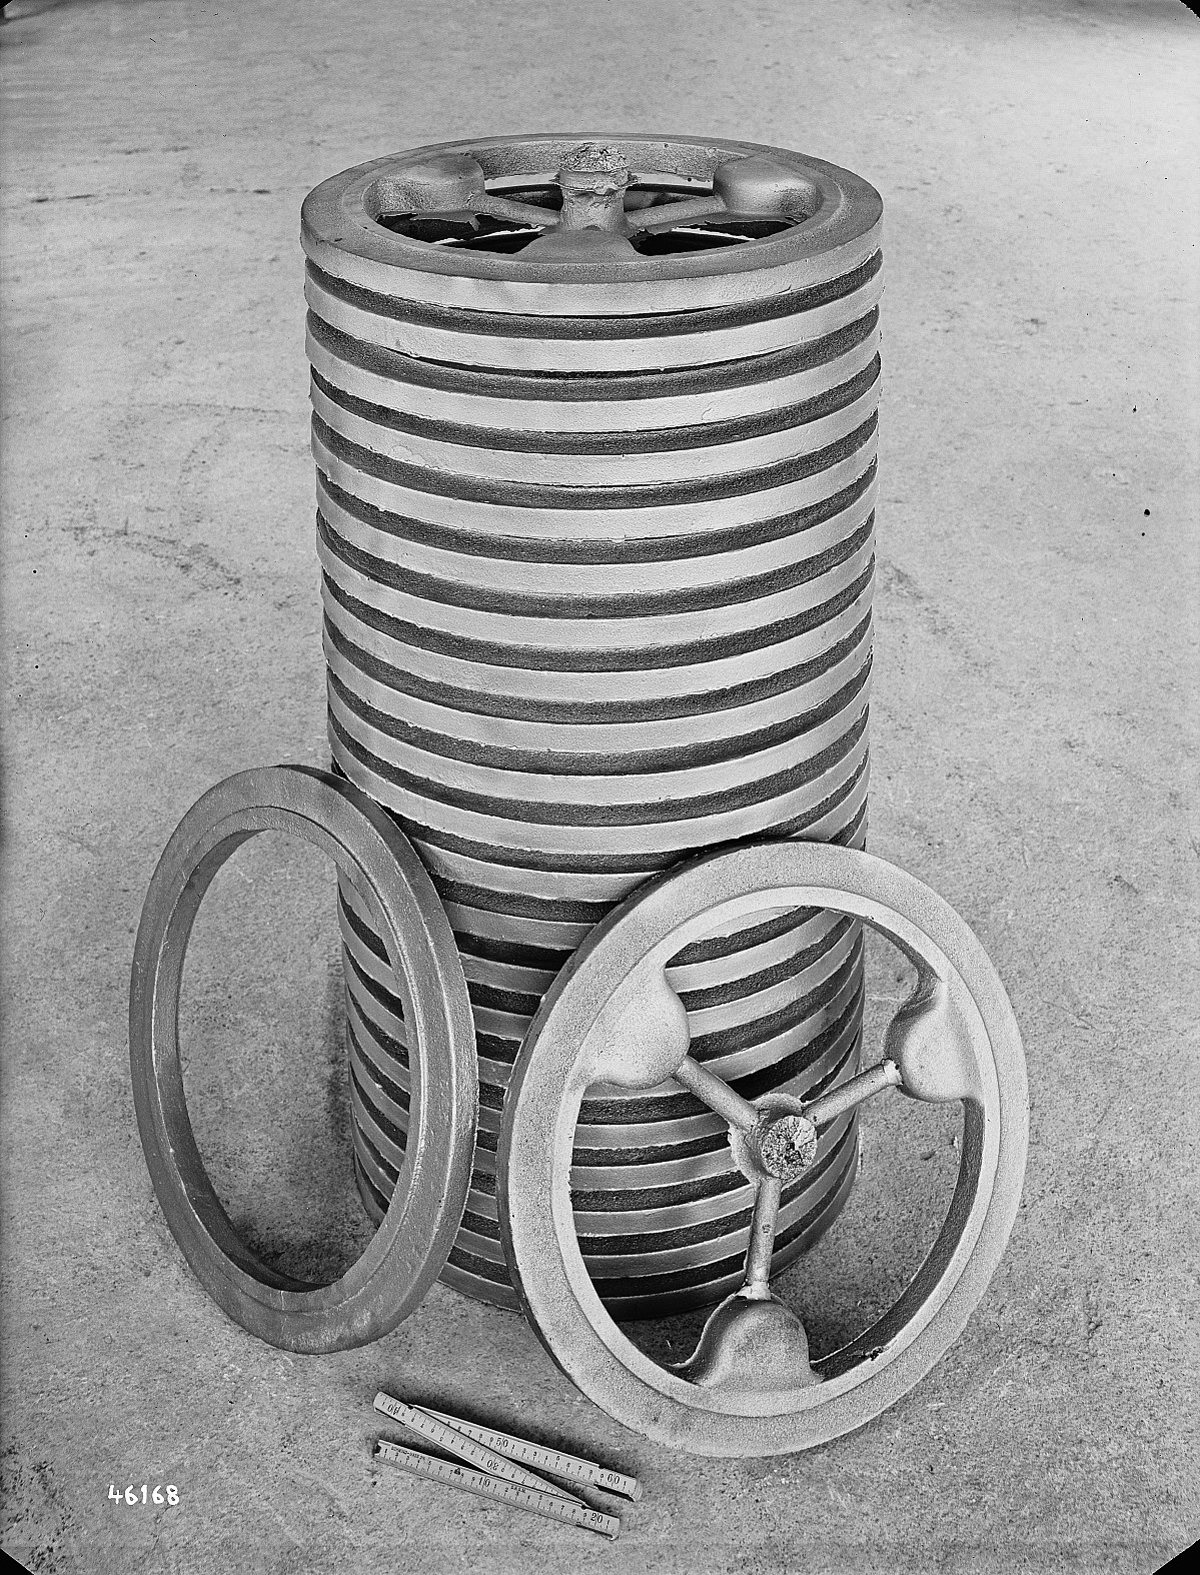 GFA 16/46168: Clamp rings for turbines BBC